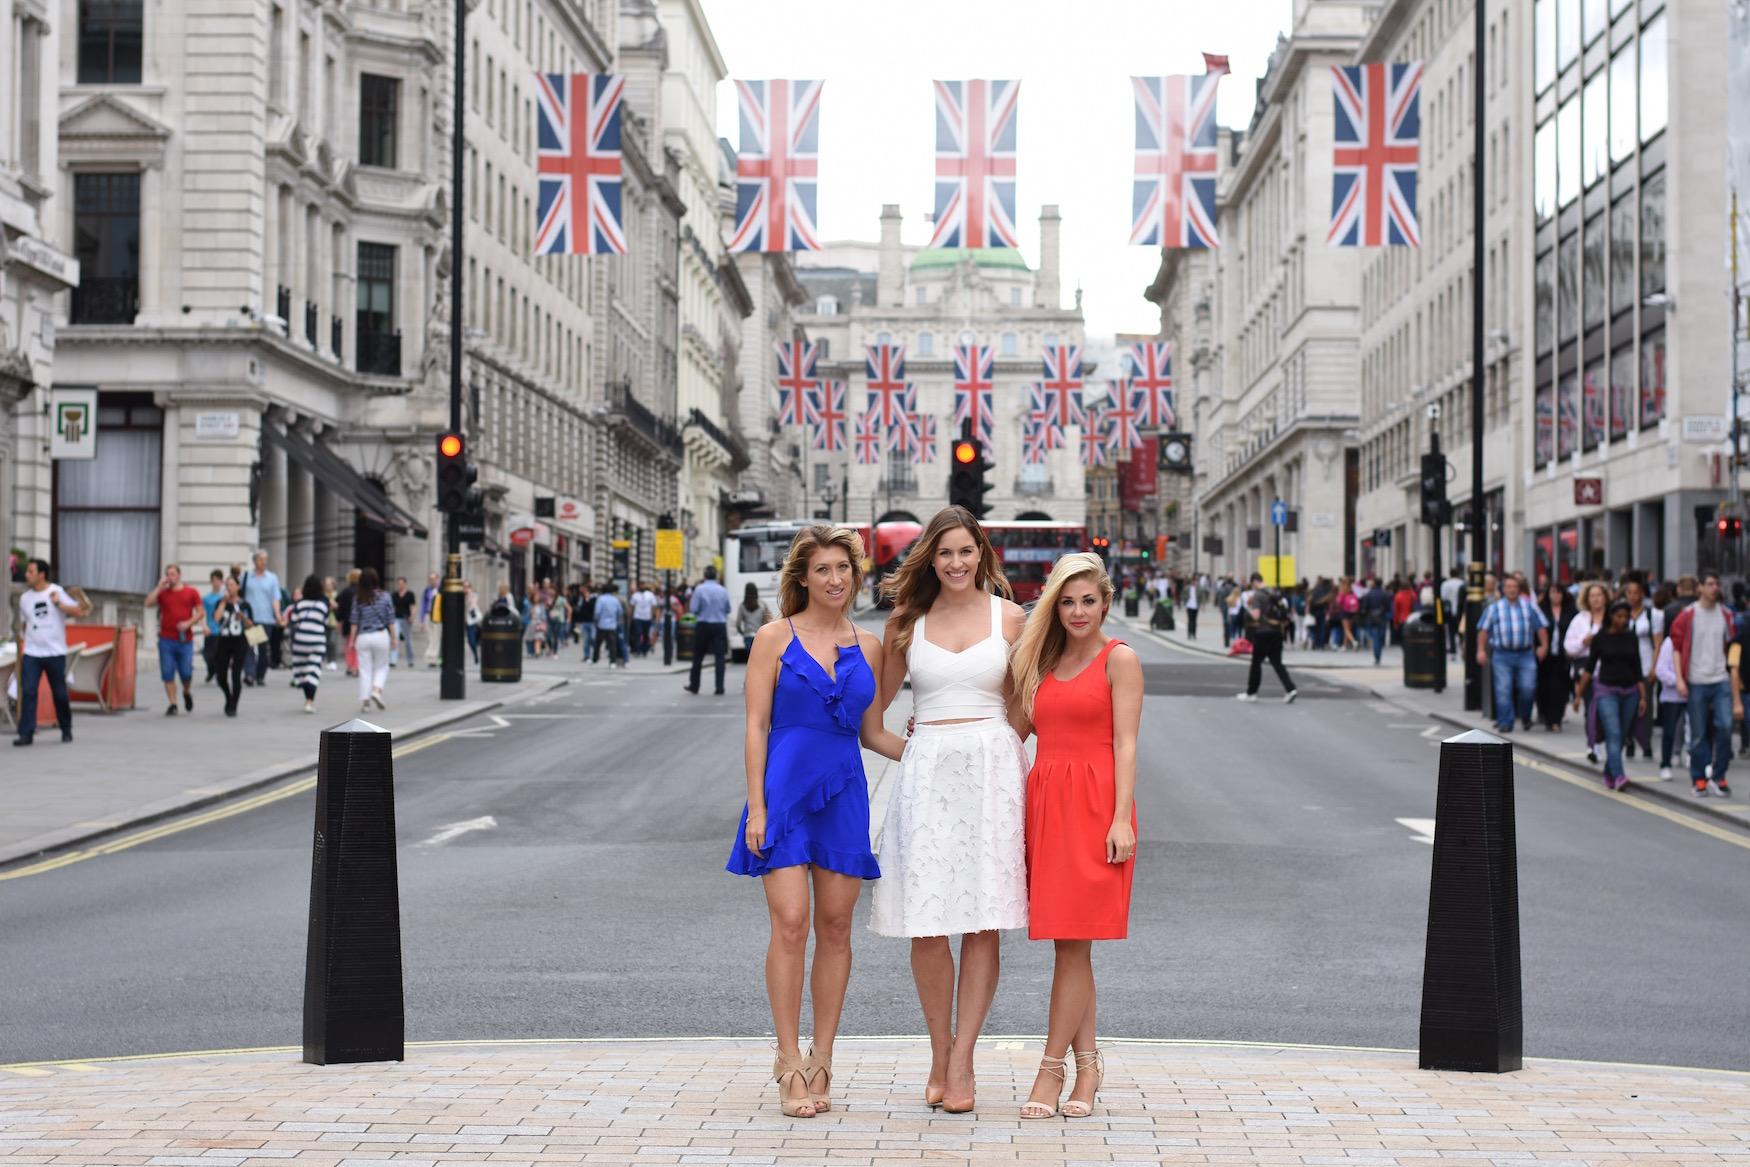 100k-we-are-travel-girls-london-65